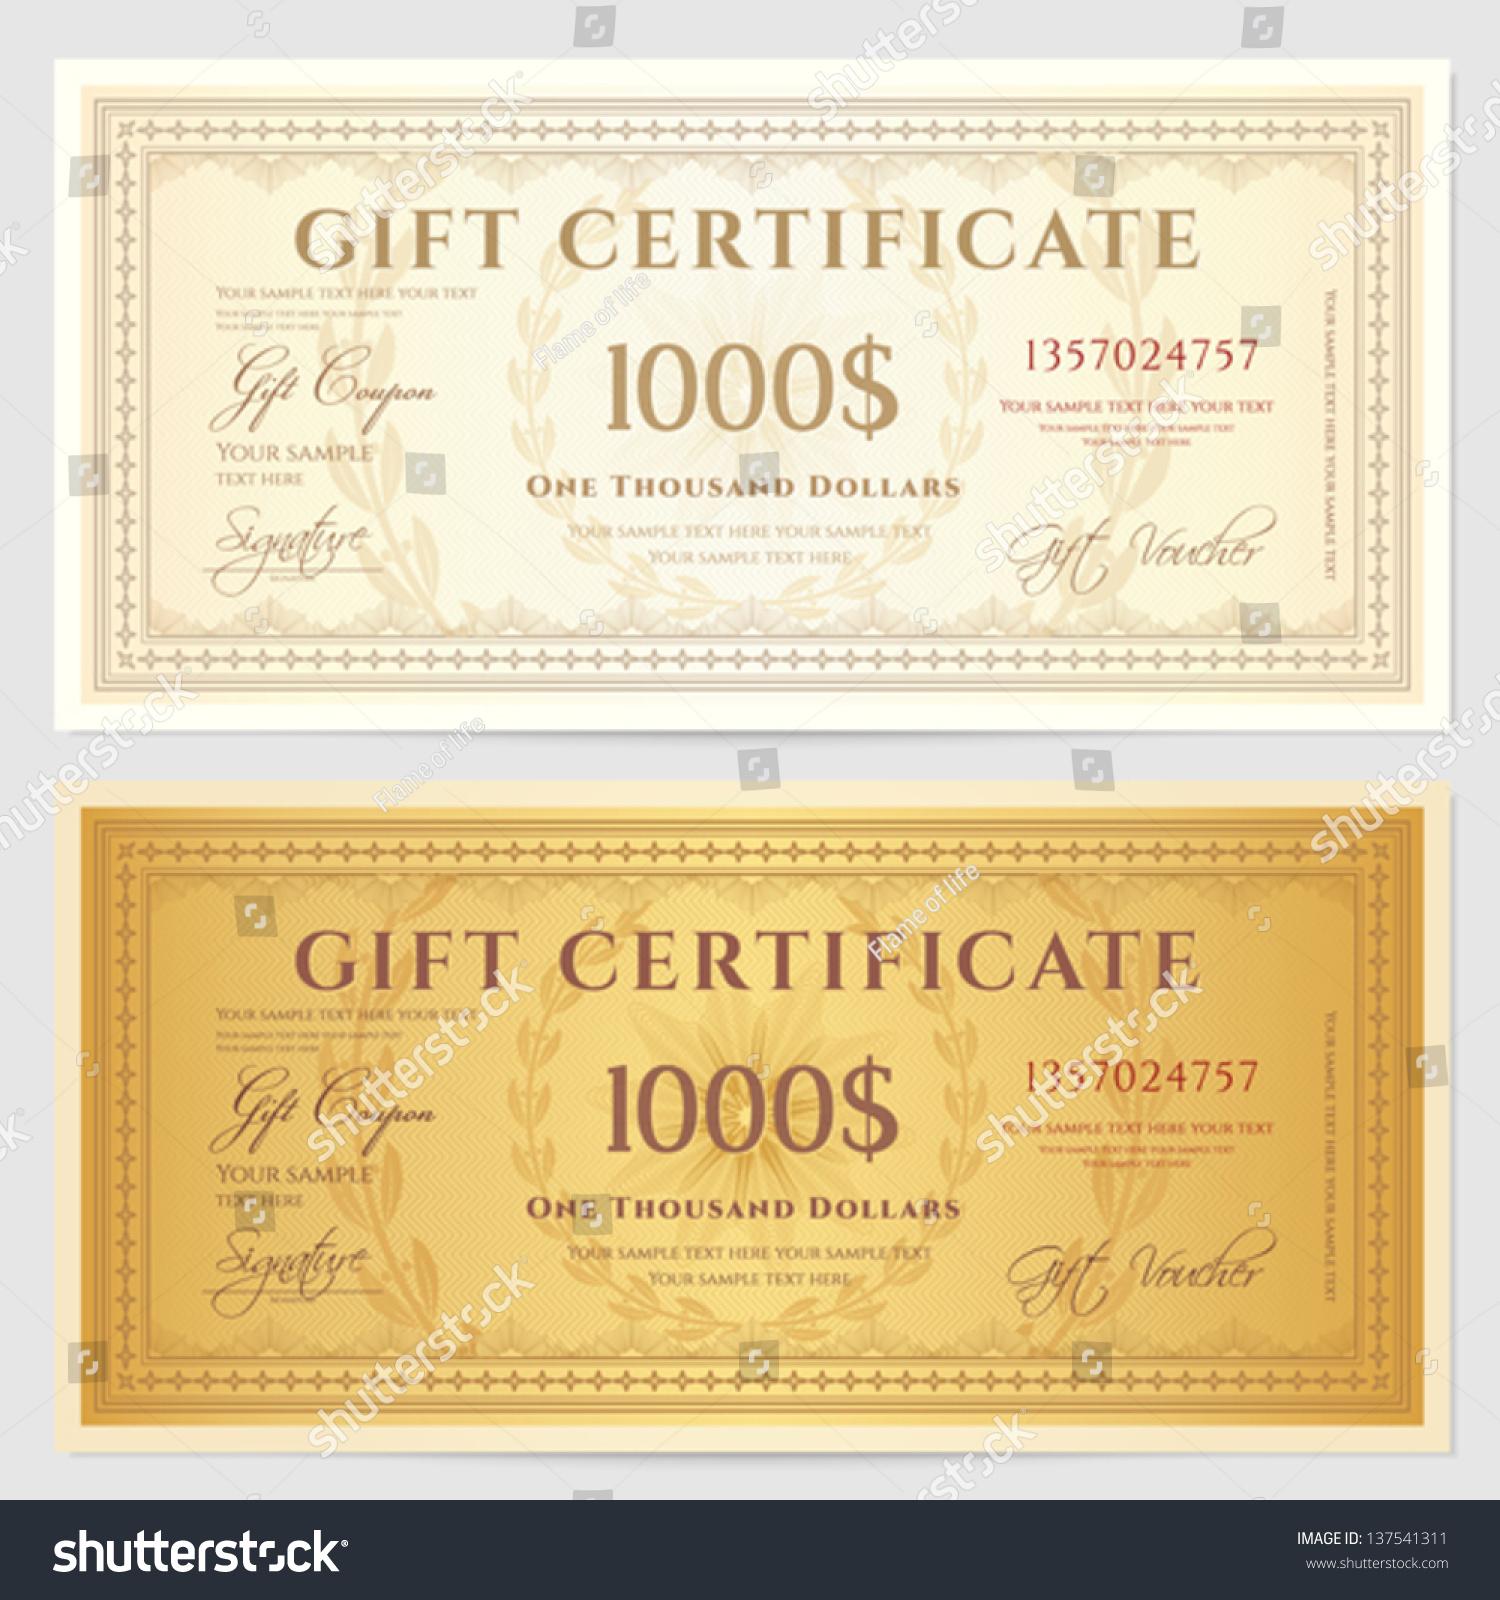 Gift Certificate Voucher Template With Guilloche Pattern – Money Voucher Template